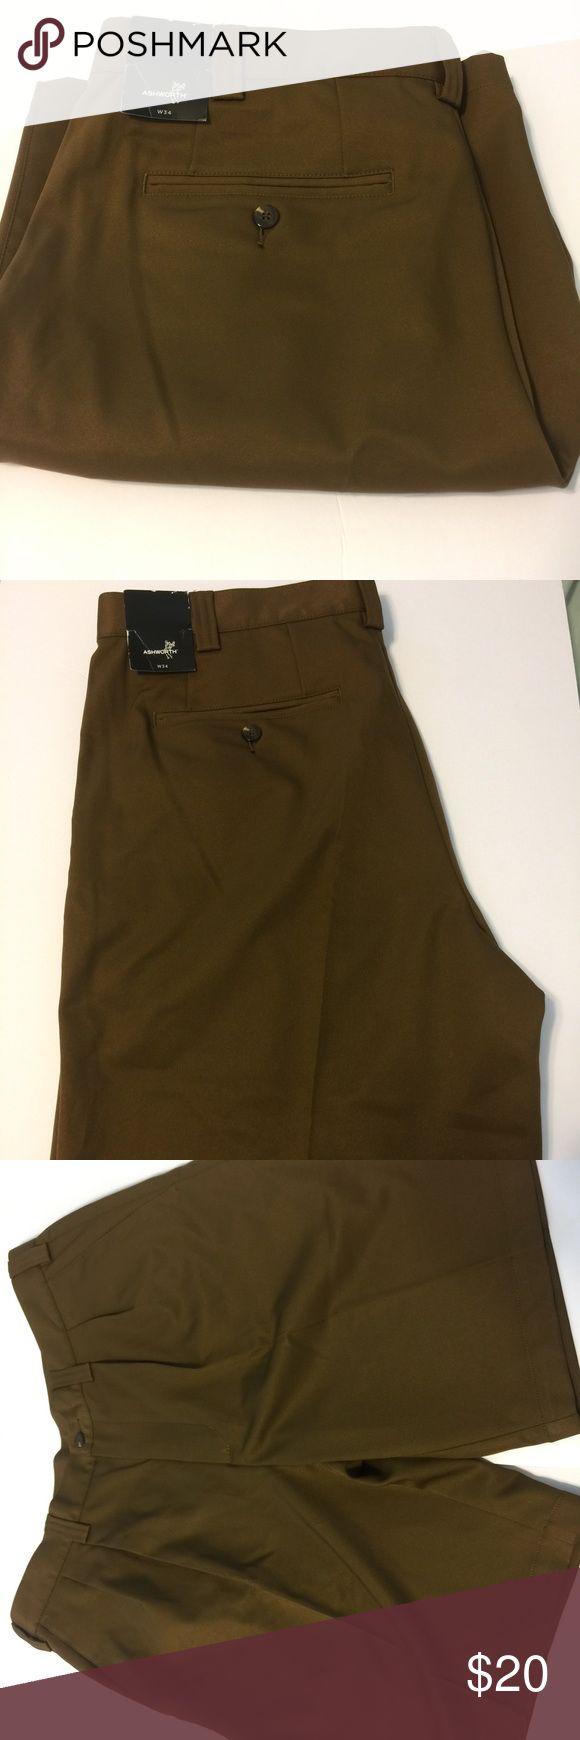 NWT Men's Ashworth Golf Shorts size W34 brown New with tags attached men's golf shorts. Size W34. Brown. Ashworth. Ashworth Shorts